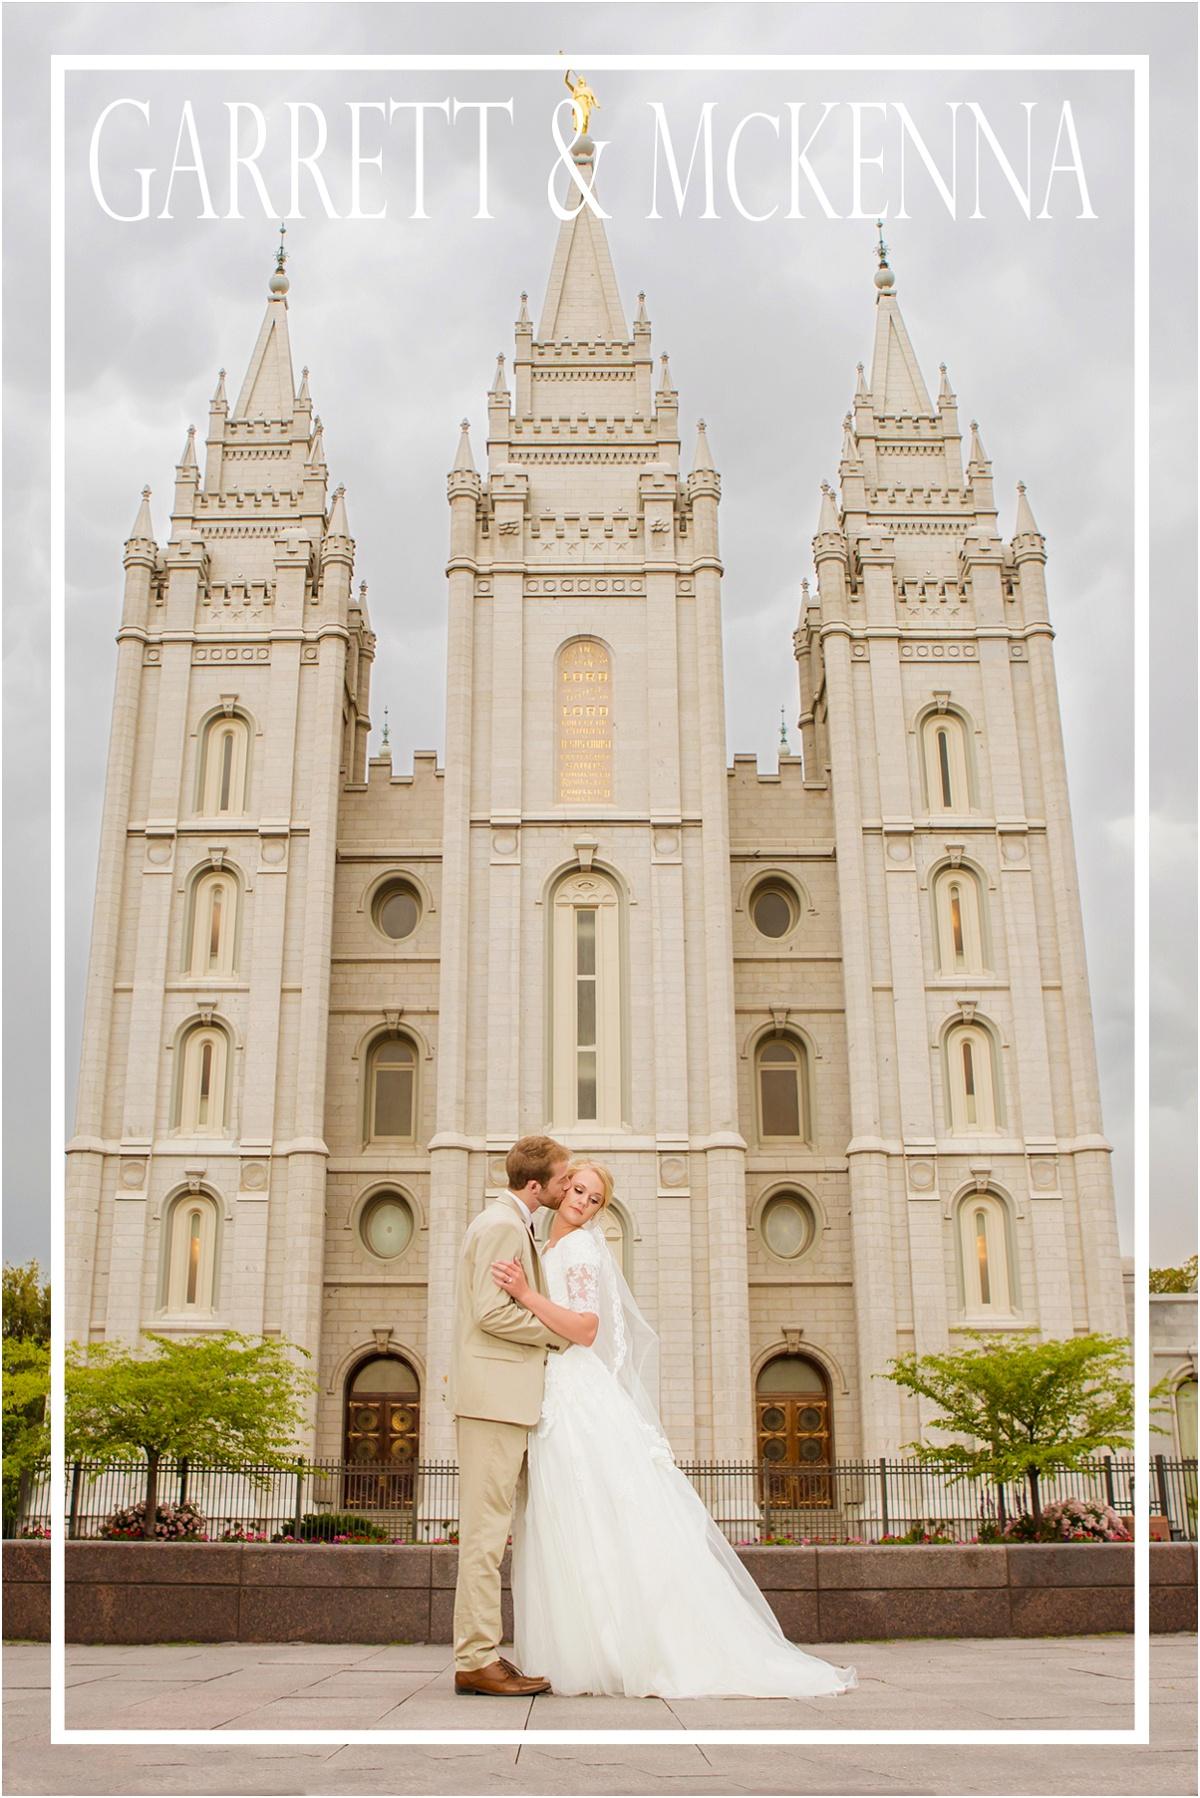 Terra Cooper Photography Weddings Brides 2015_5386.jpg